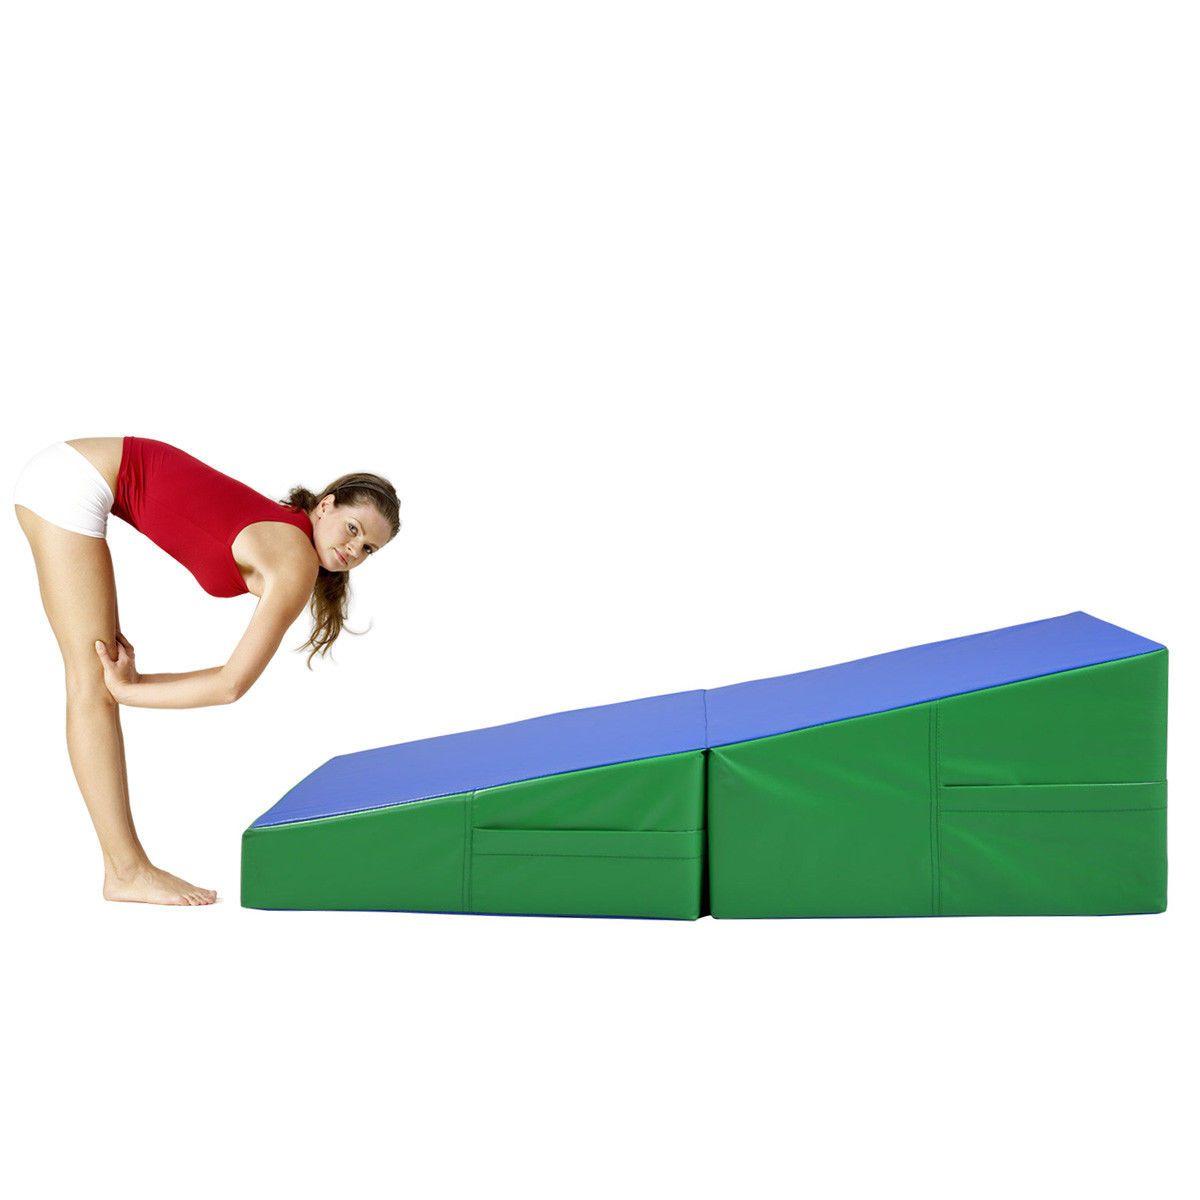 x best choice com mat tumbling cheese wedge mats cheap superonlinesaver products incline shape gymnastics folding skill